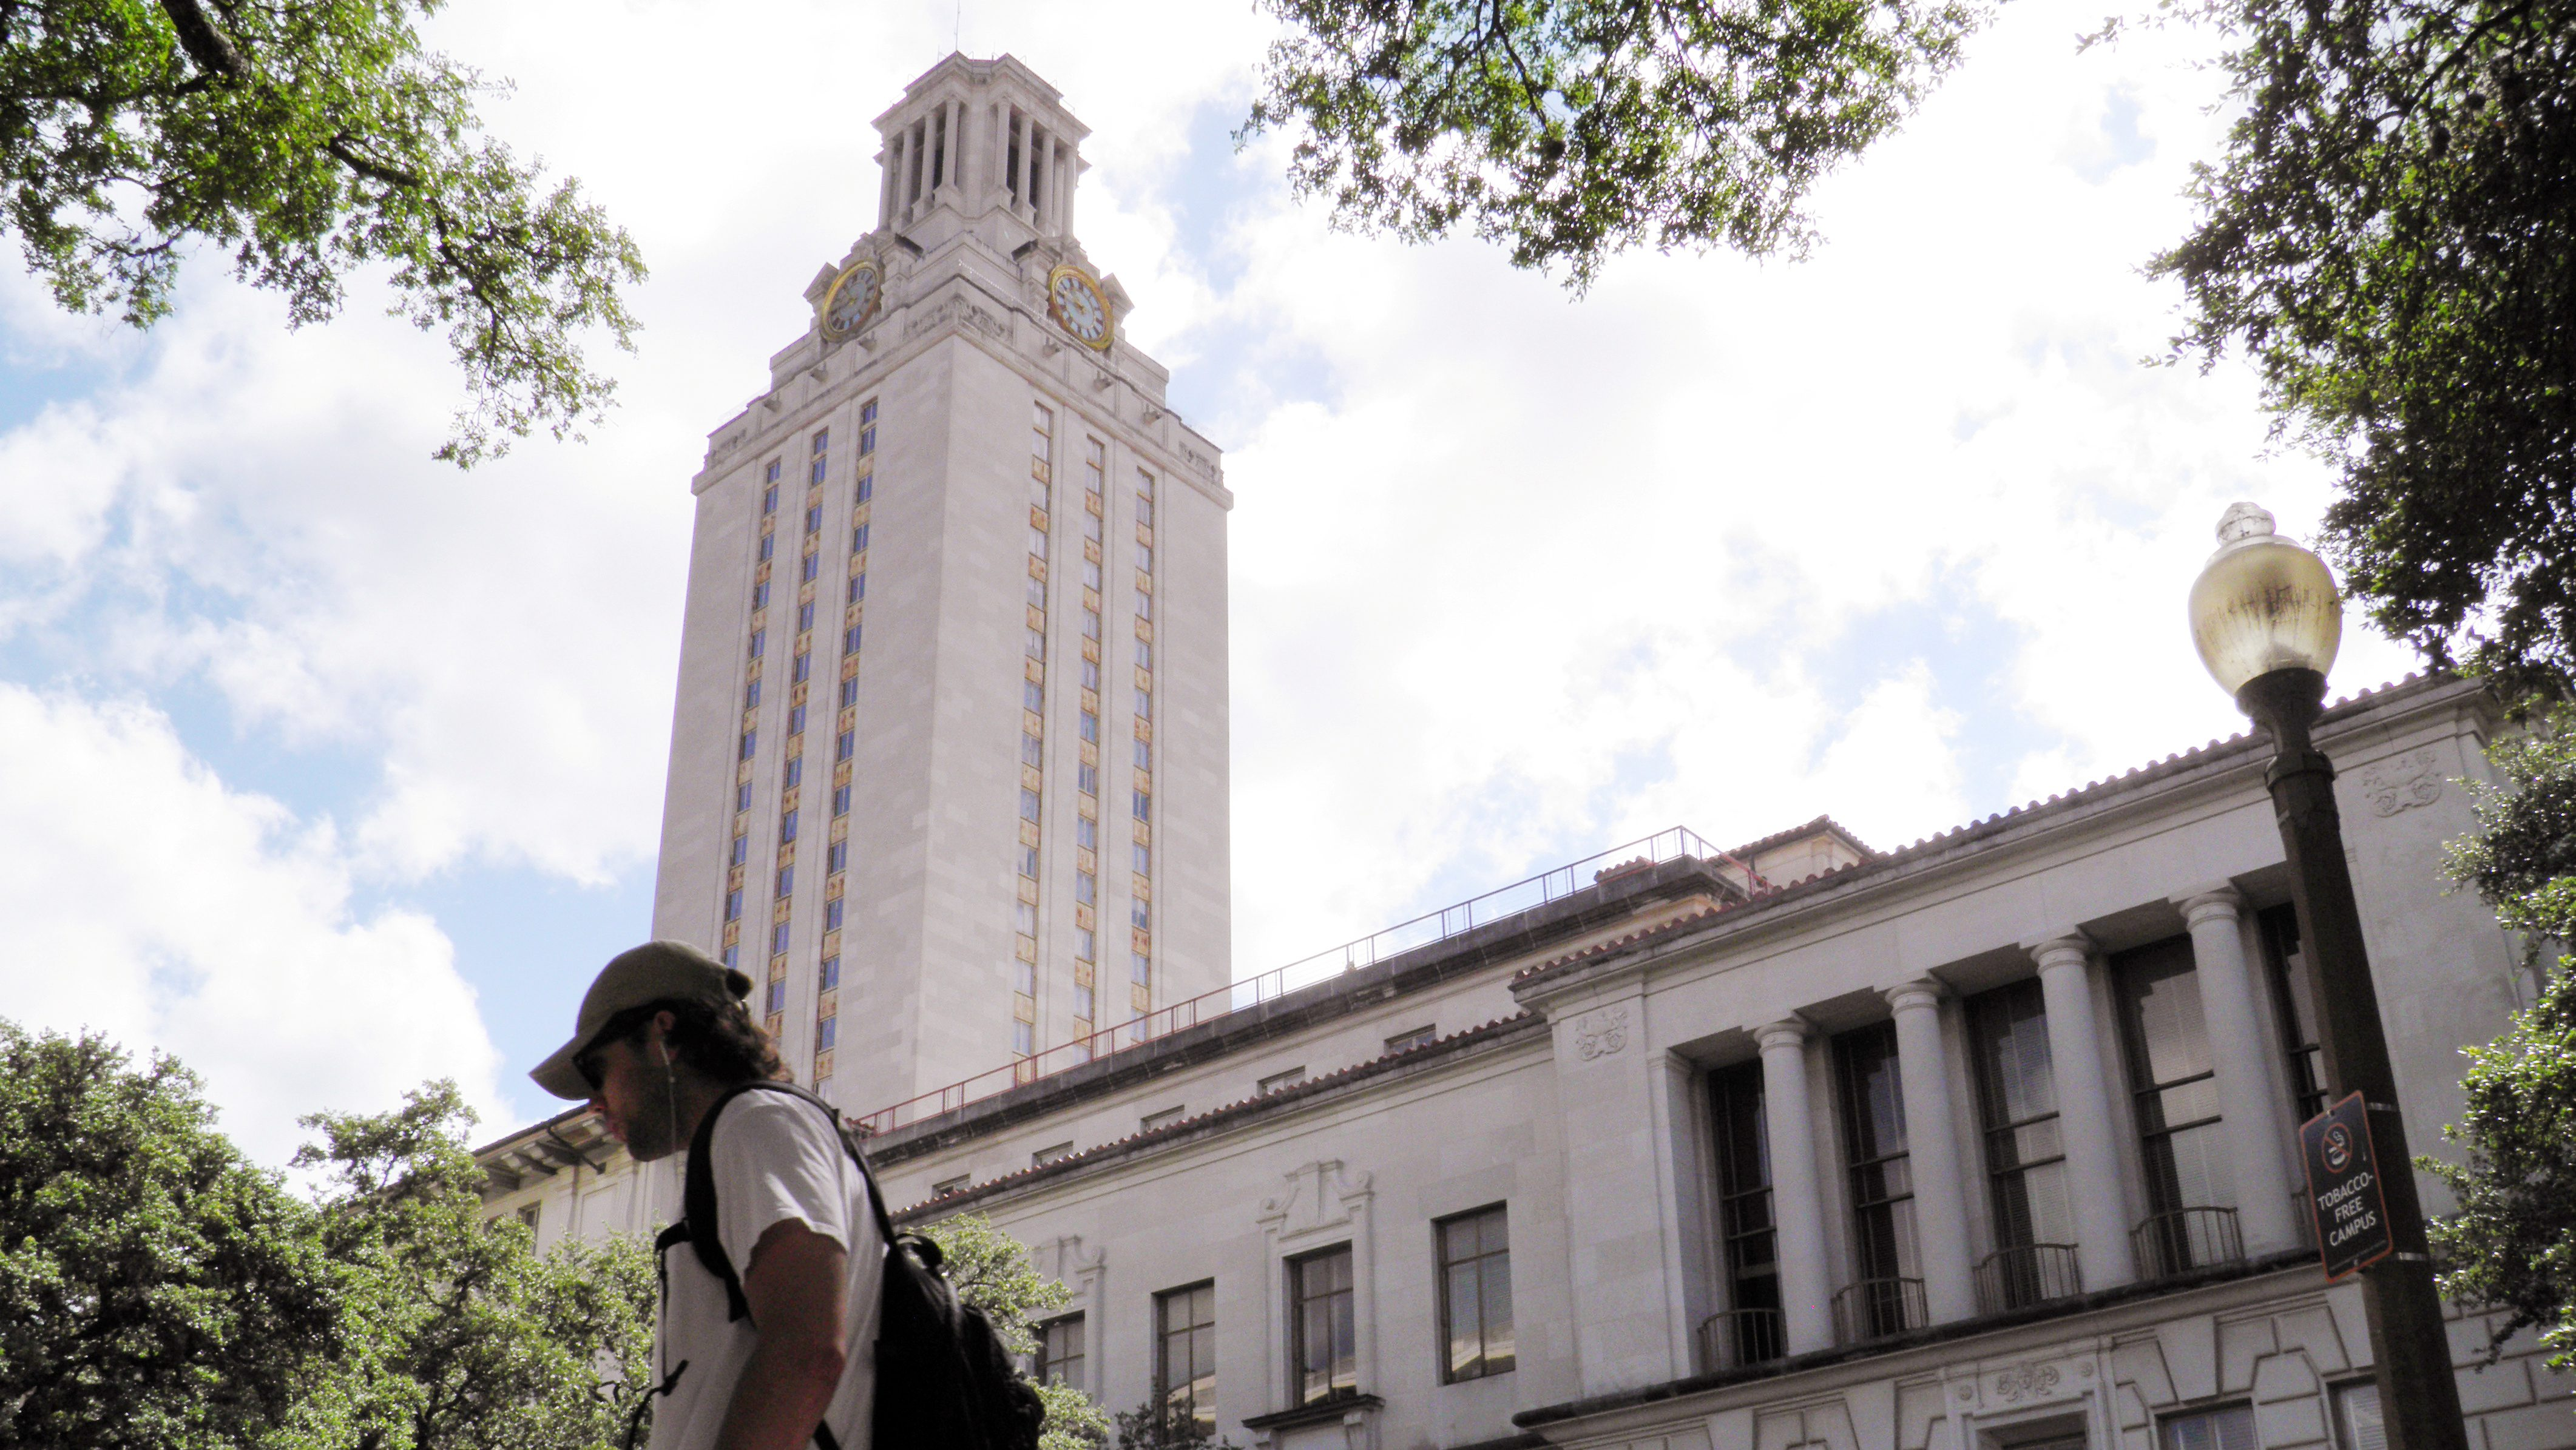 FILE PHOTO: A student walks at the University of Texas campus in Austin, Texas, U.S., on June 23, 2016.  REUTERS/Jon Herskovitz/File Photo - RTS14OXV